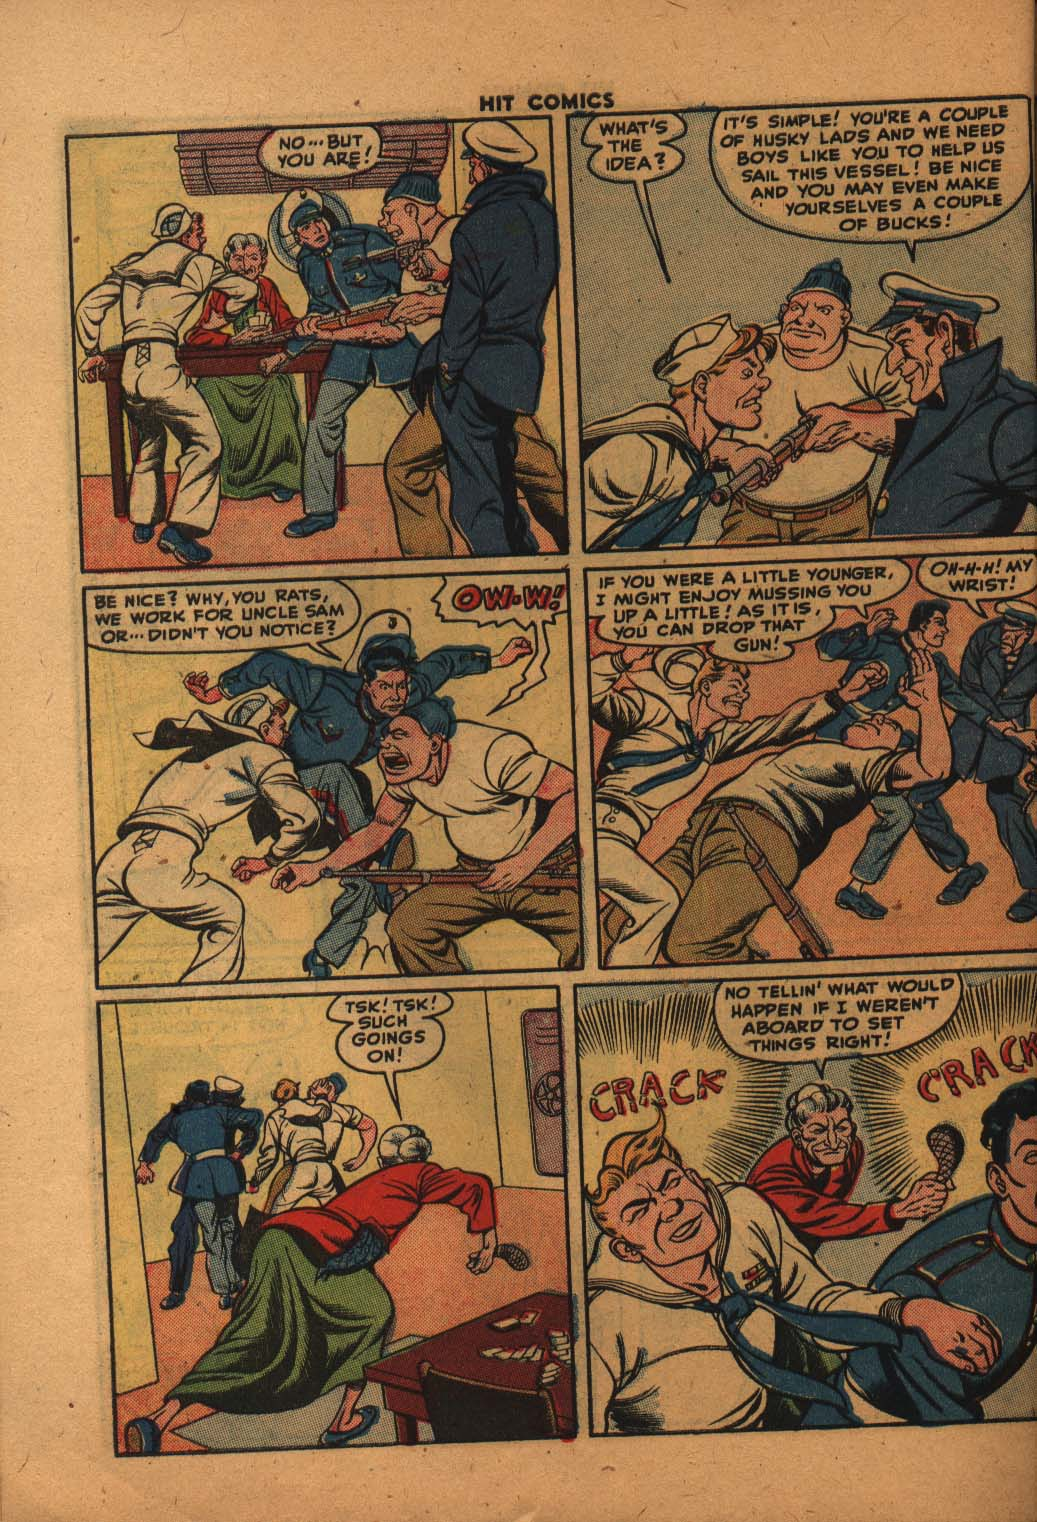 Read online Hit Comics comic -  Issue #47 - 41